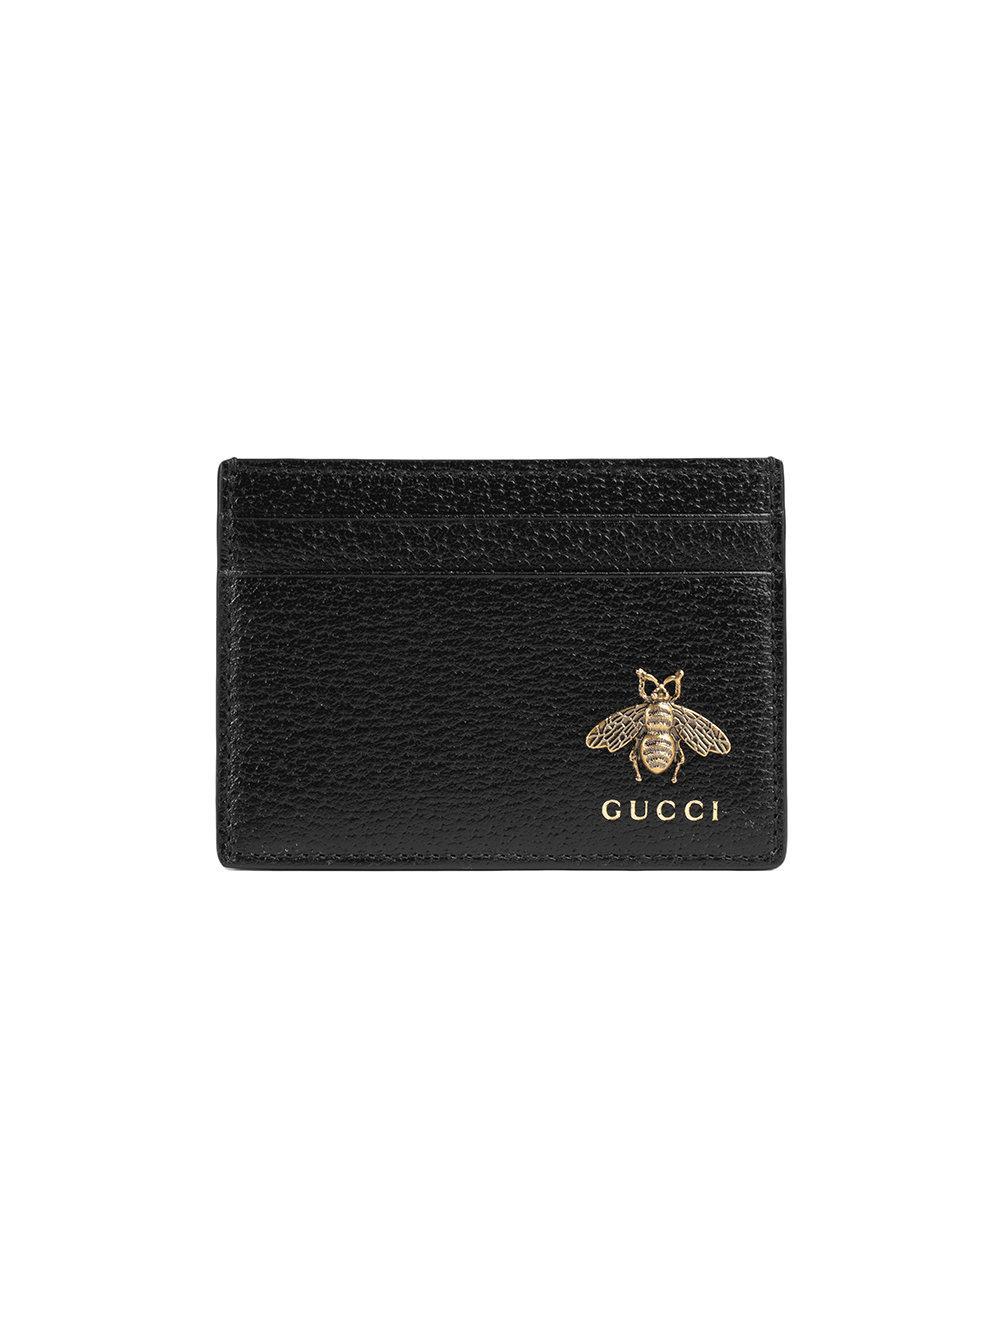 ea21264033dcd3 Gucci Animalier Leather Card Case - Black In 1000 Nero | ModeSens